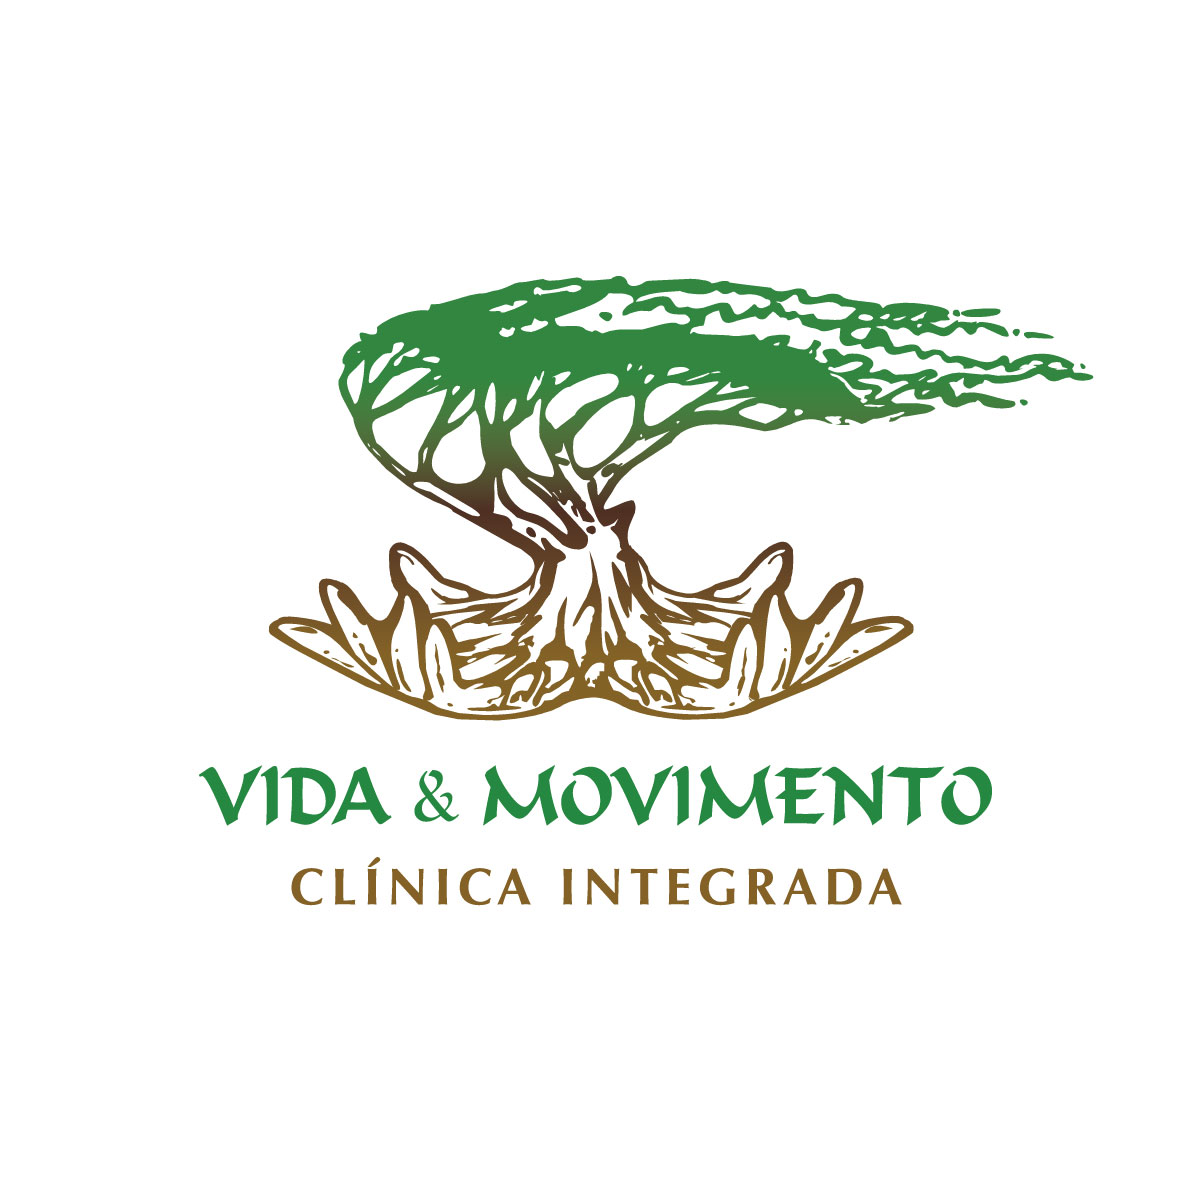 CLÍNICA INTEGRADA VIDA & MOVIMENTO